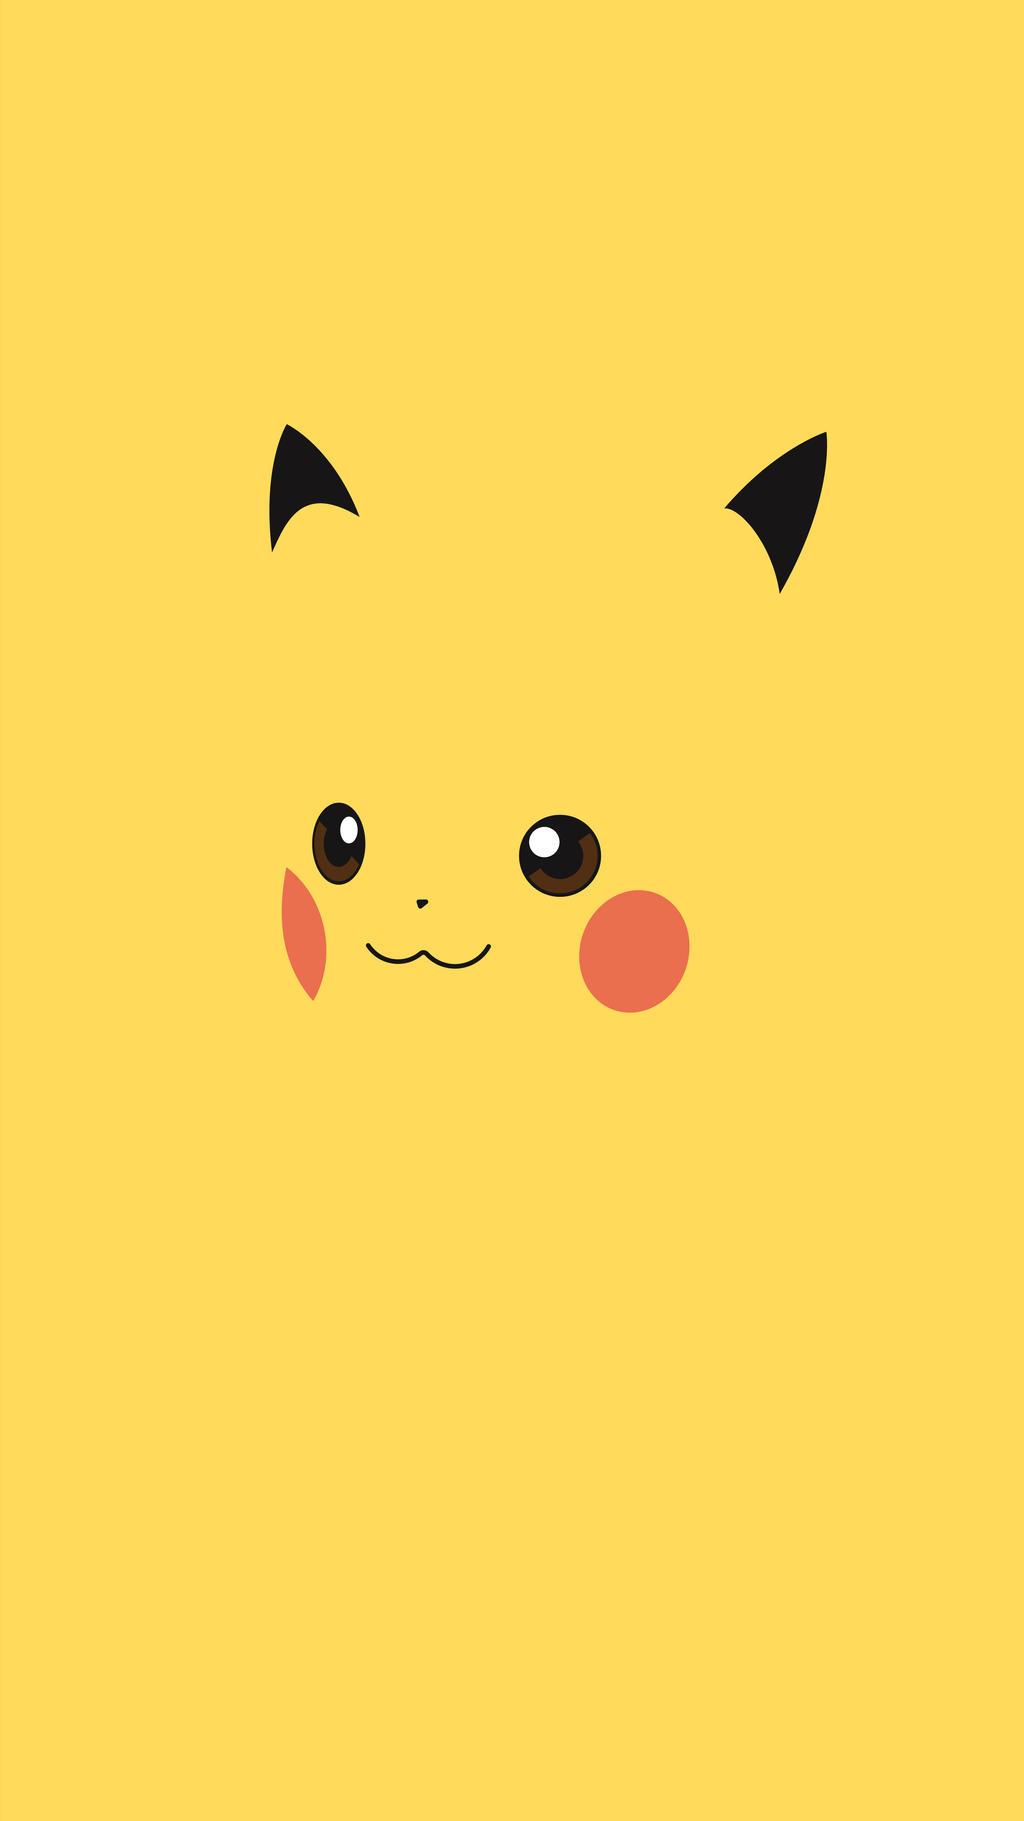 Cute pikachu iphone wallpapers